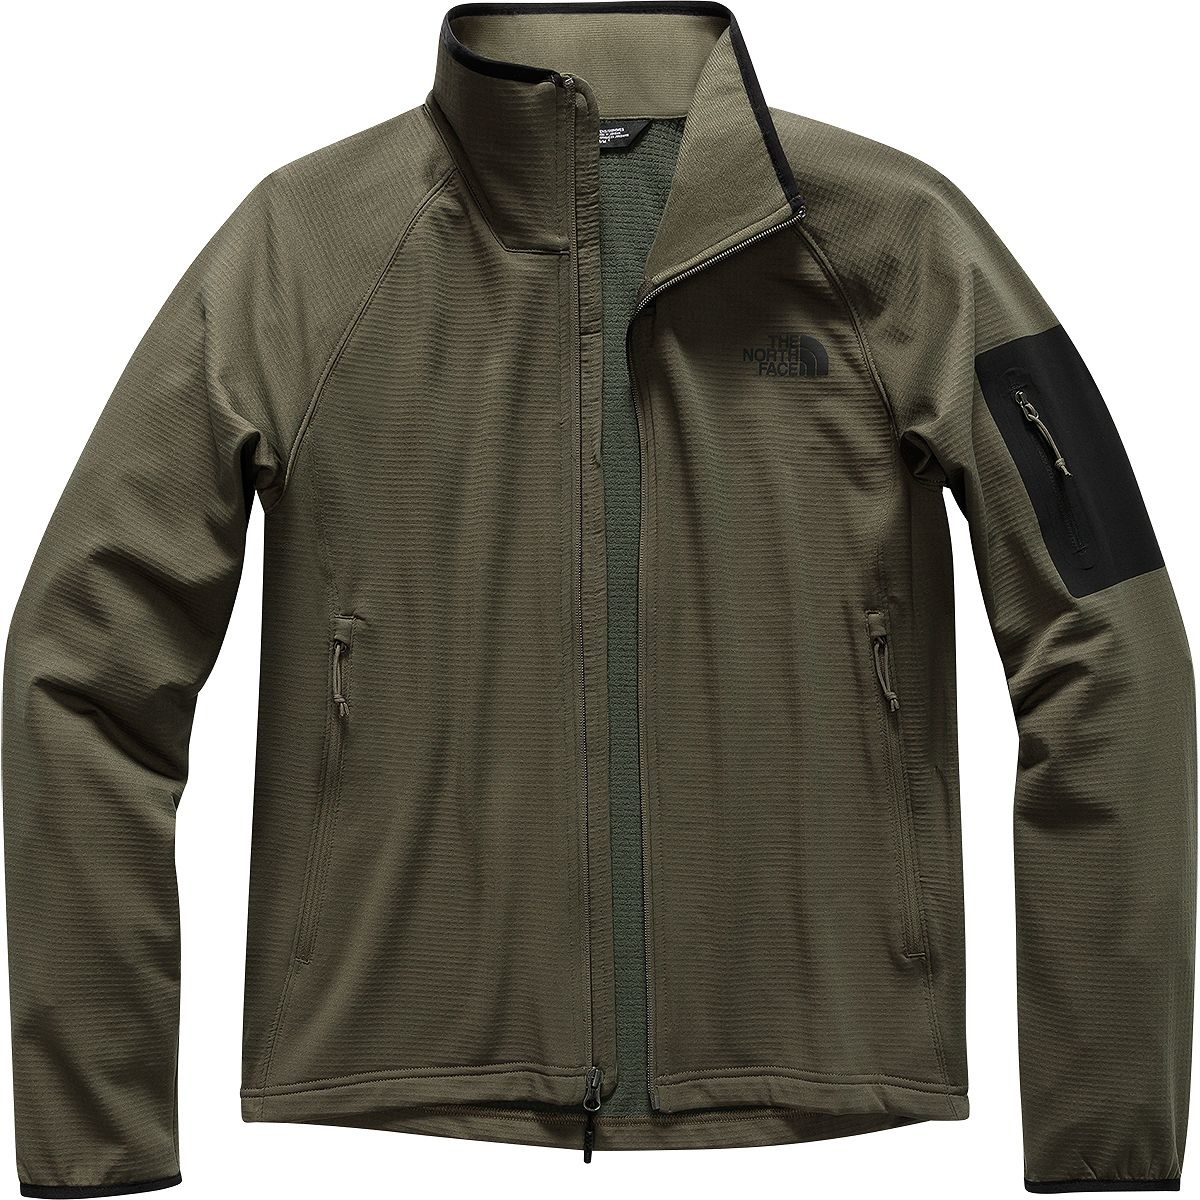 6fd1e47c8 Men's Borod Full Zip NF0A2VE1 BQW-New Taupe Green/TNF Black